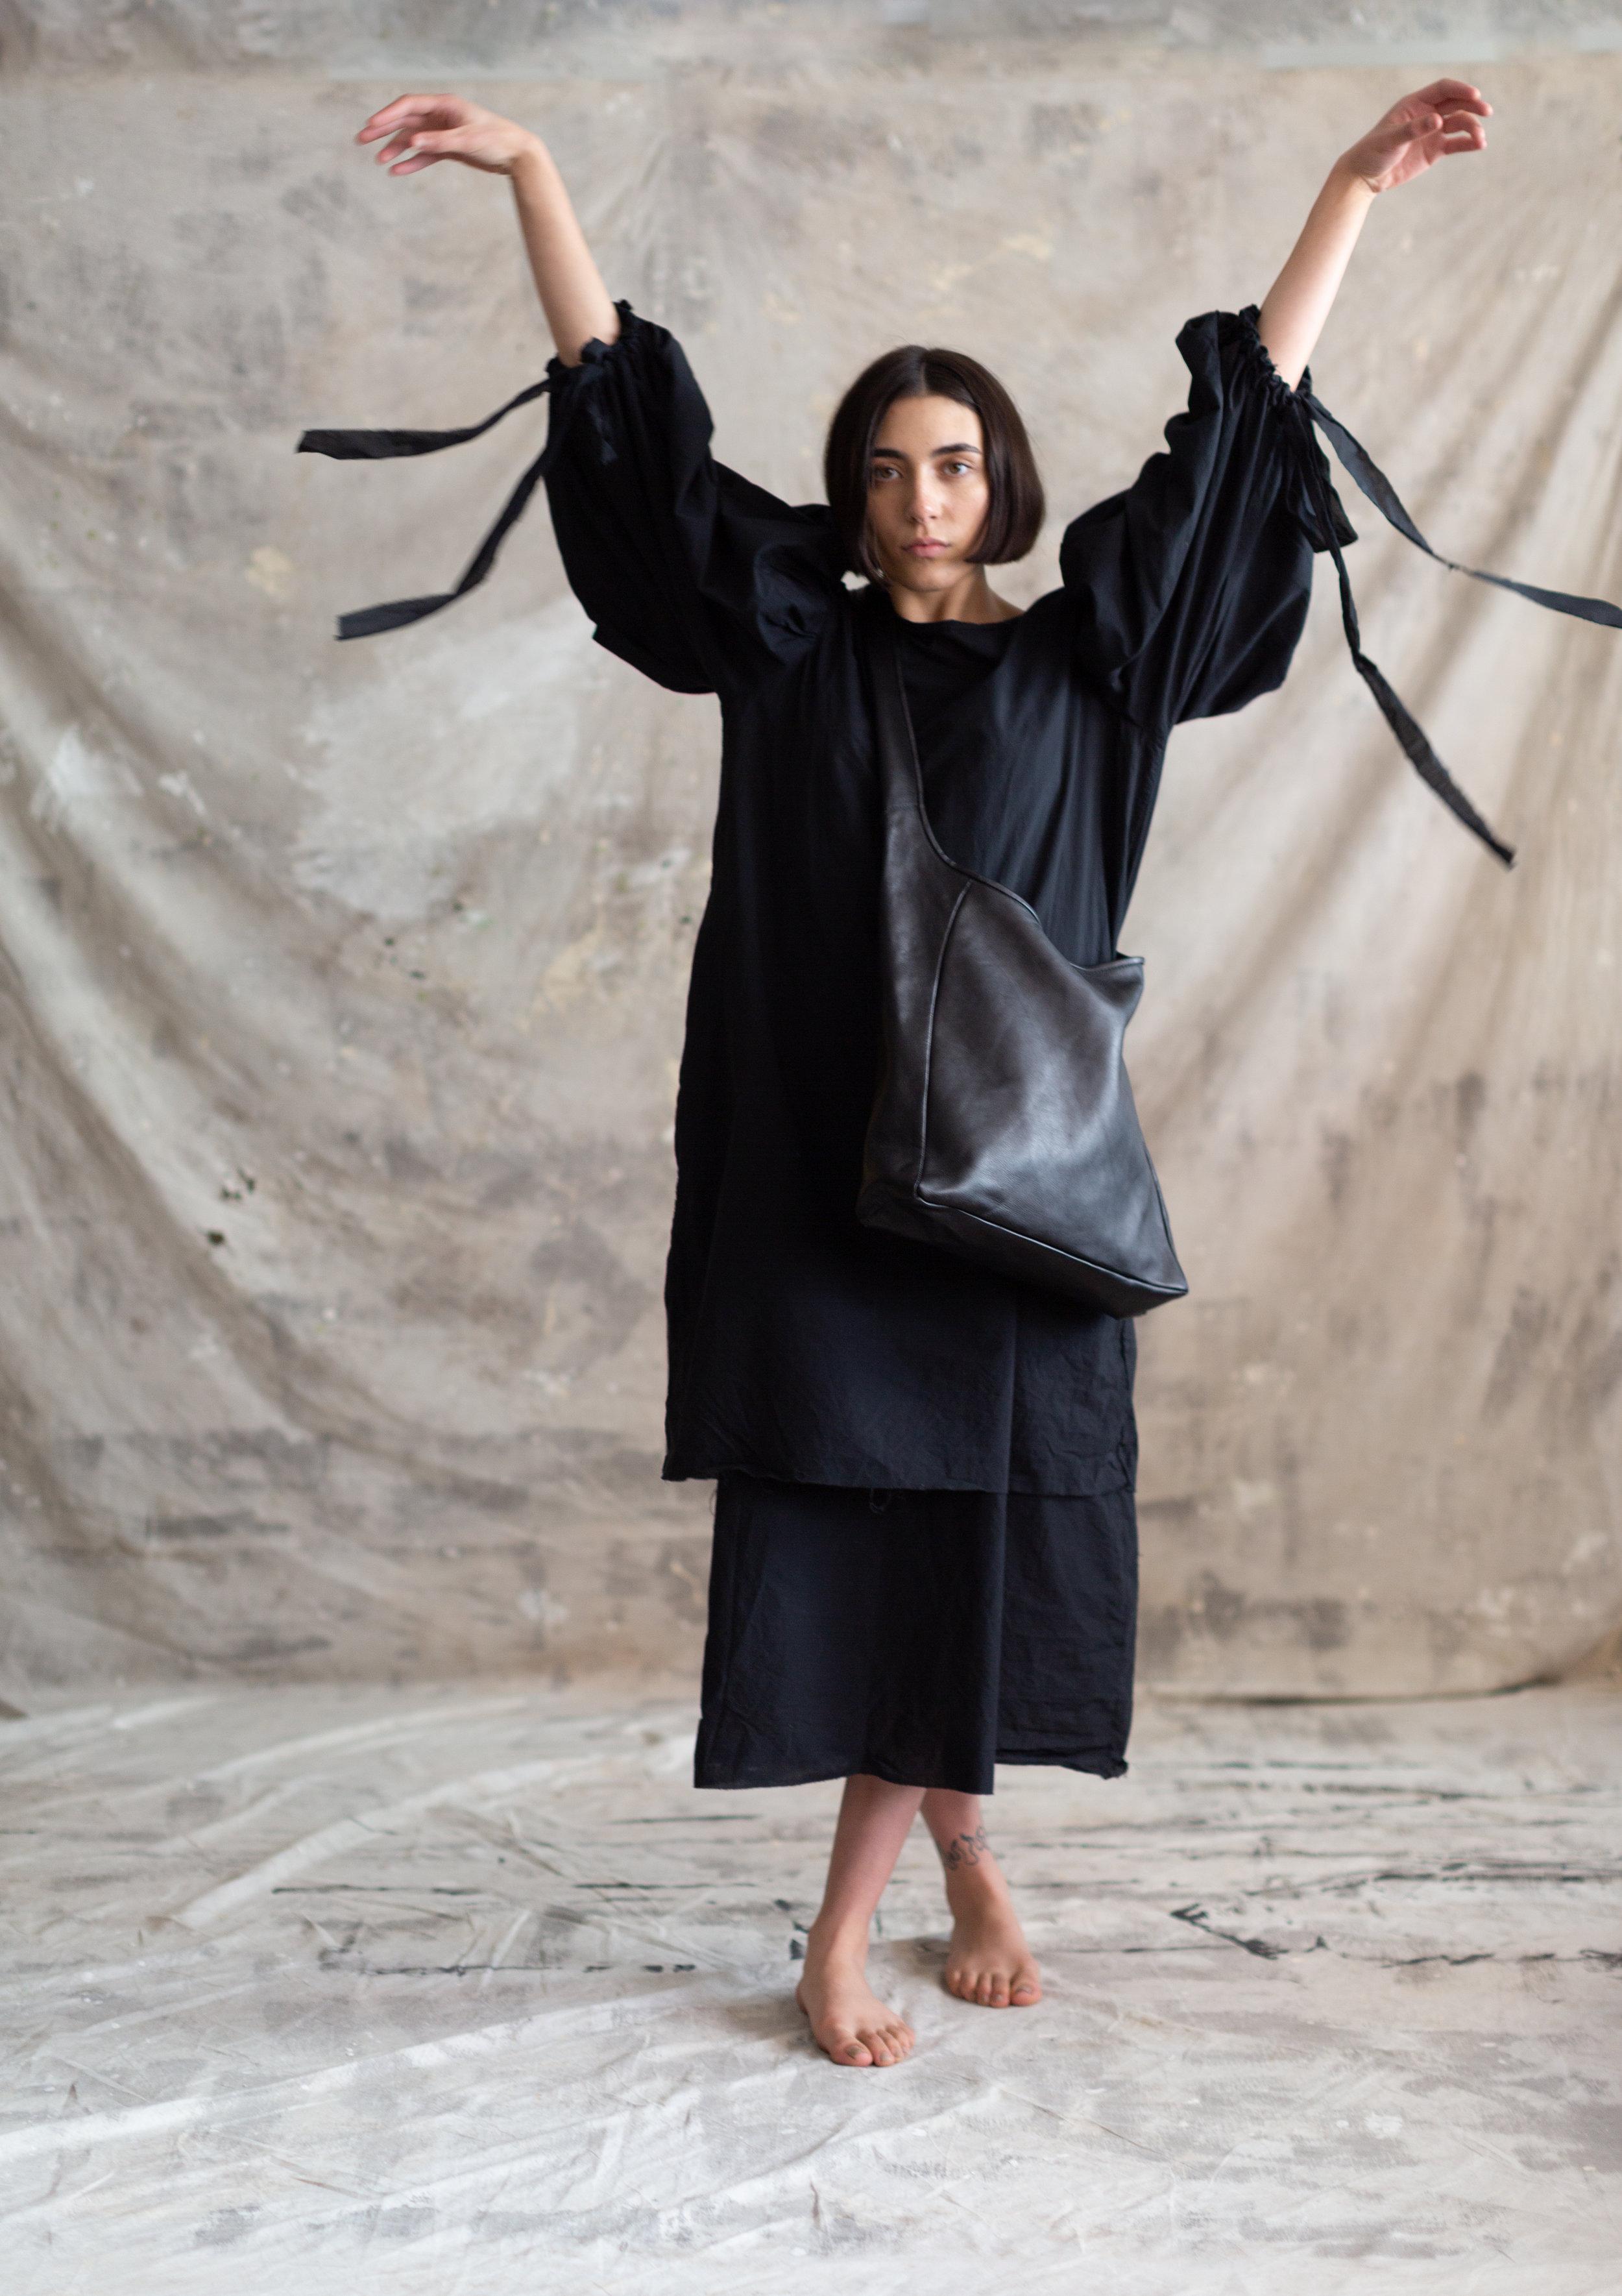 Pennyroyal Maureen in black veg tan